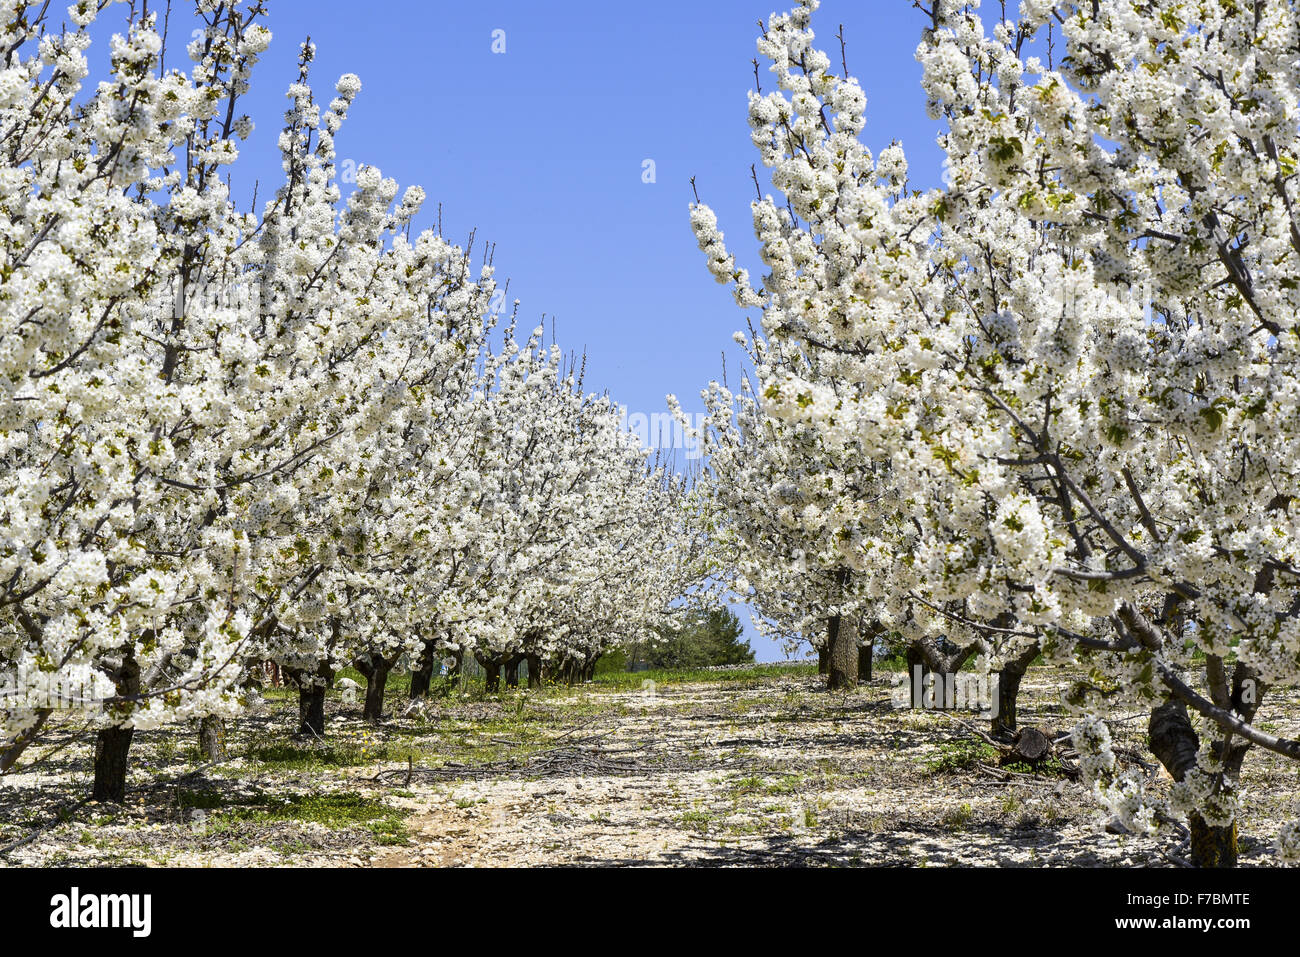 Cherry Blossom, Apulia, Italy - Stock Image